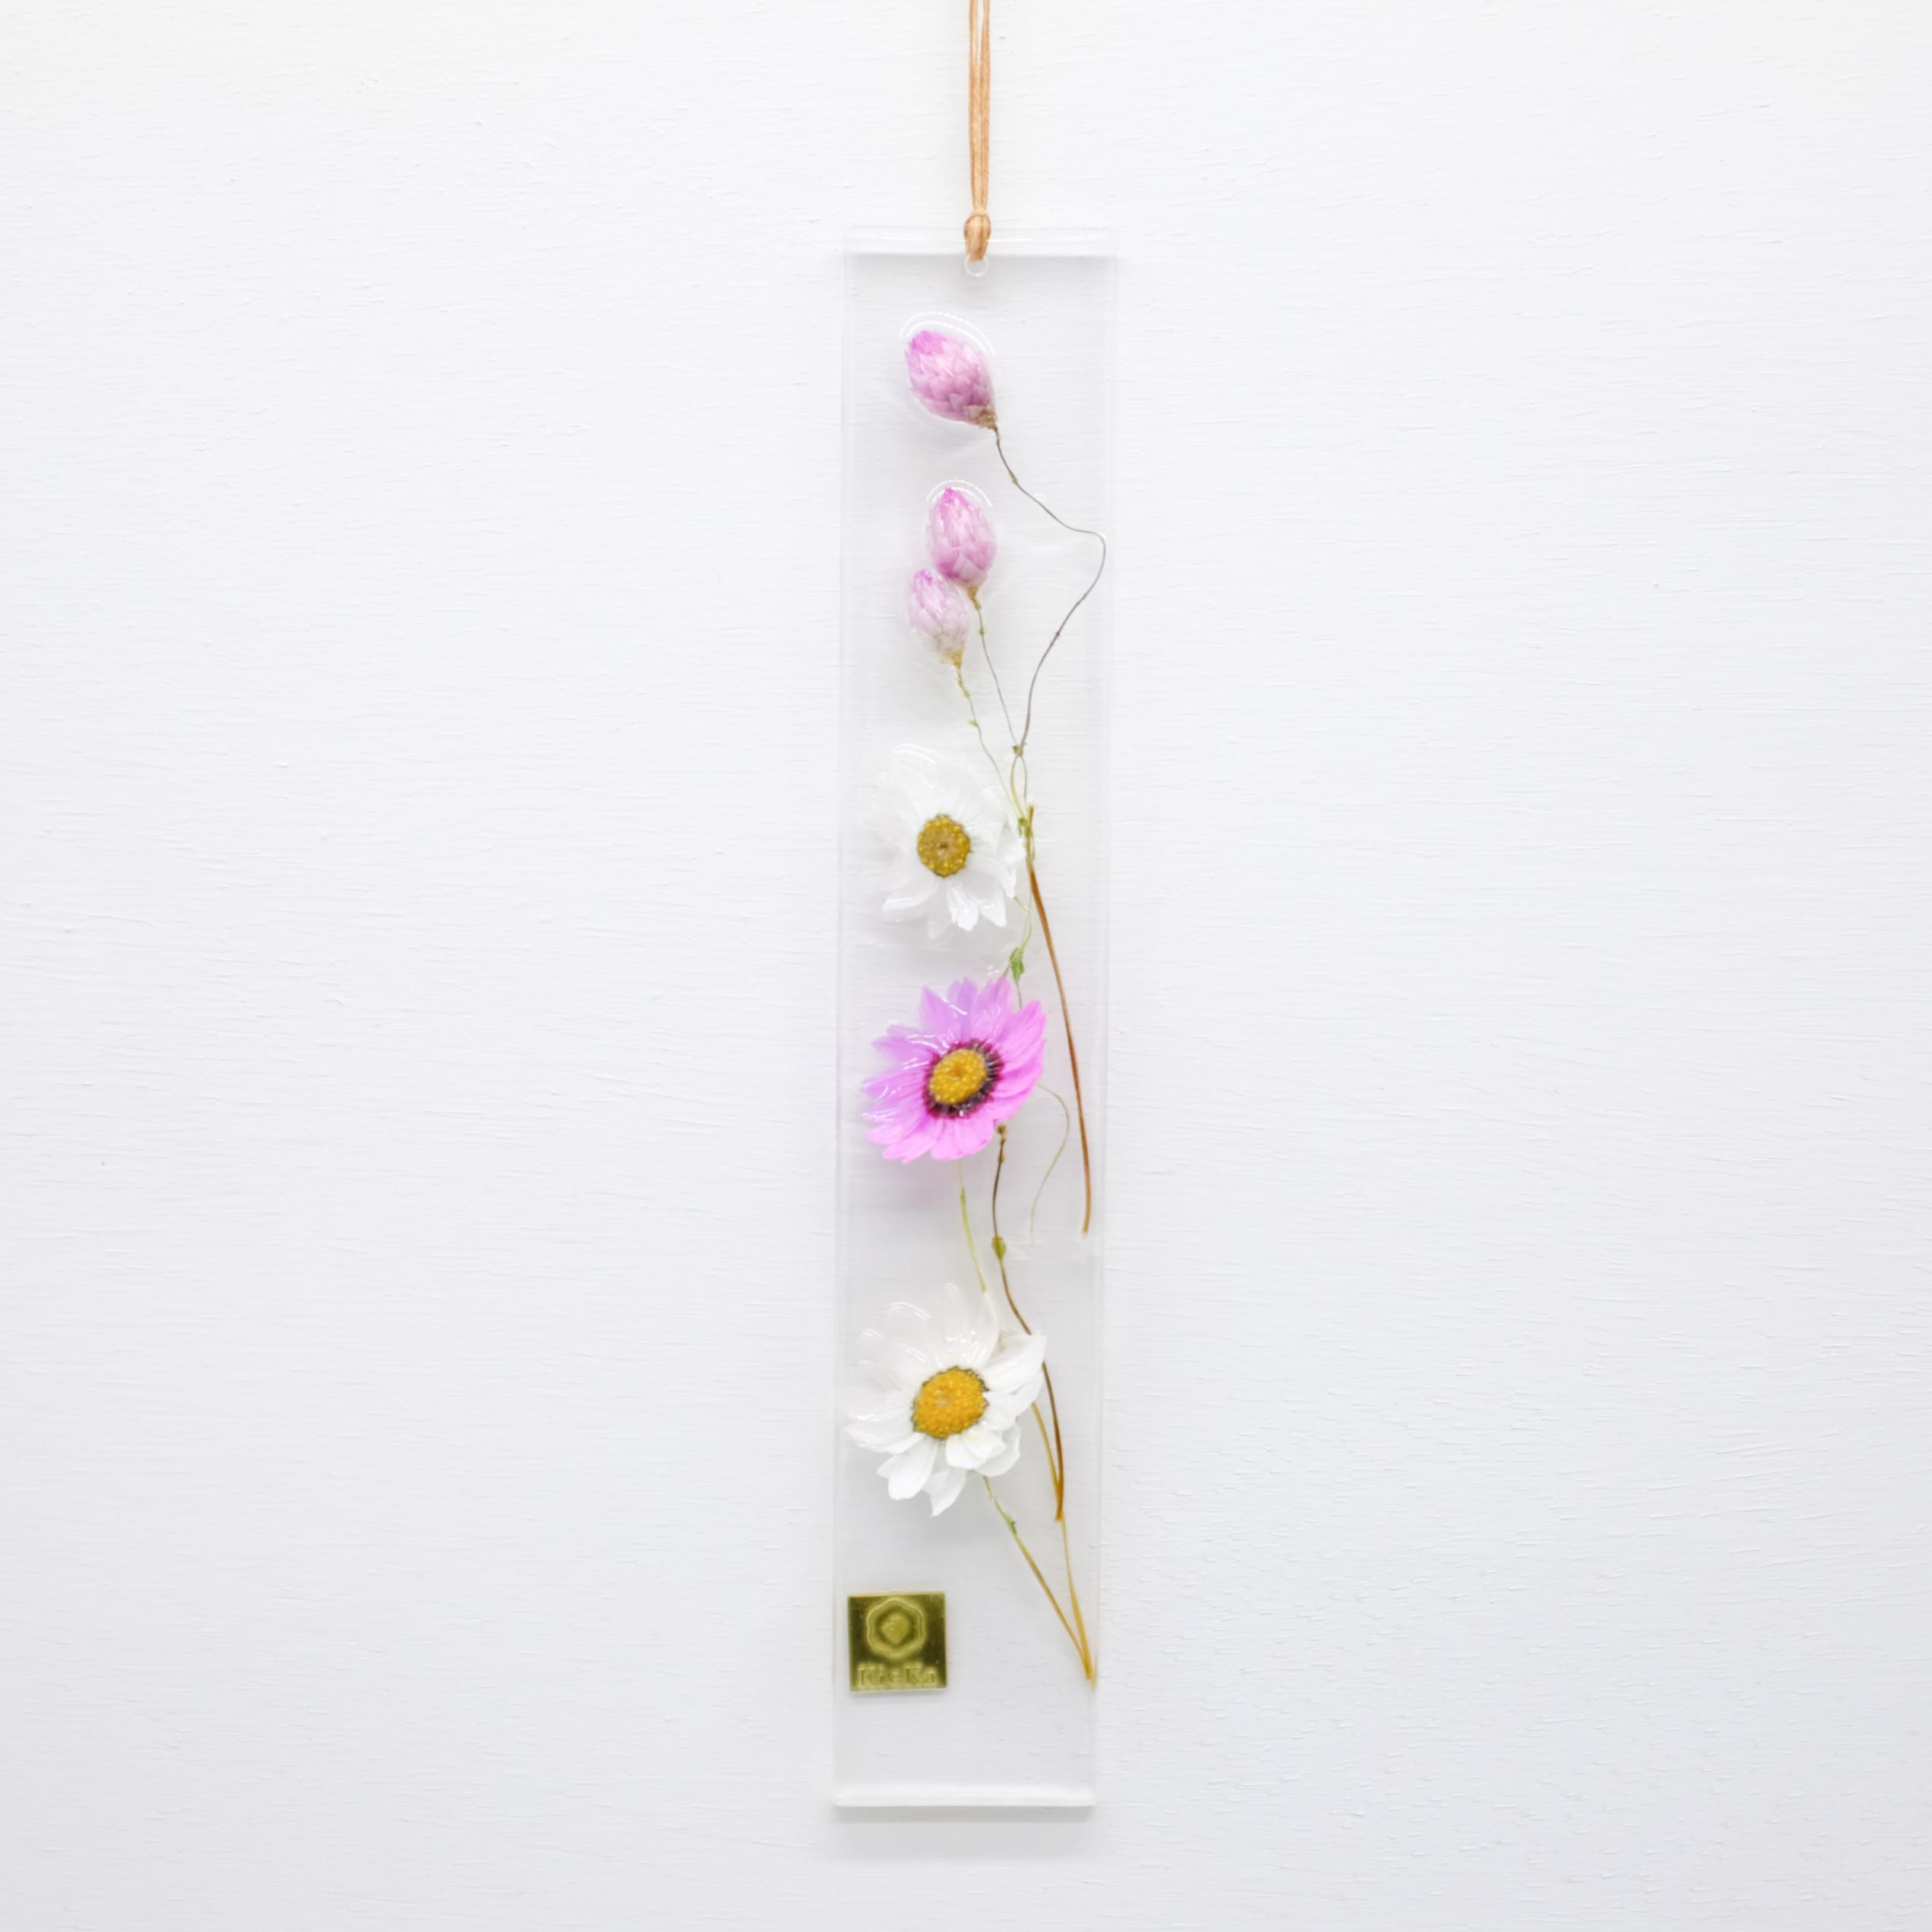 dried flower S ローダンセ ピンクホワイト 限定 S